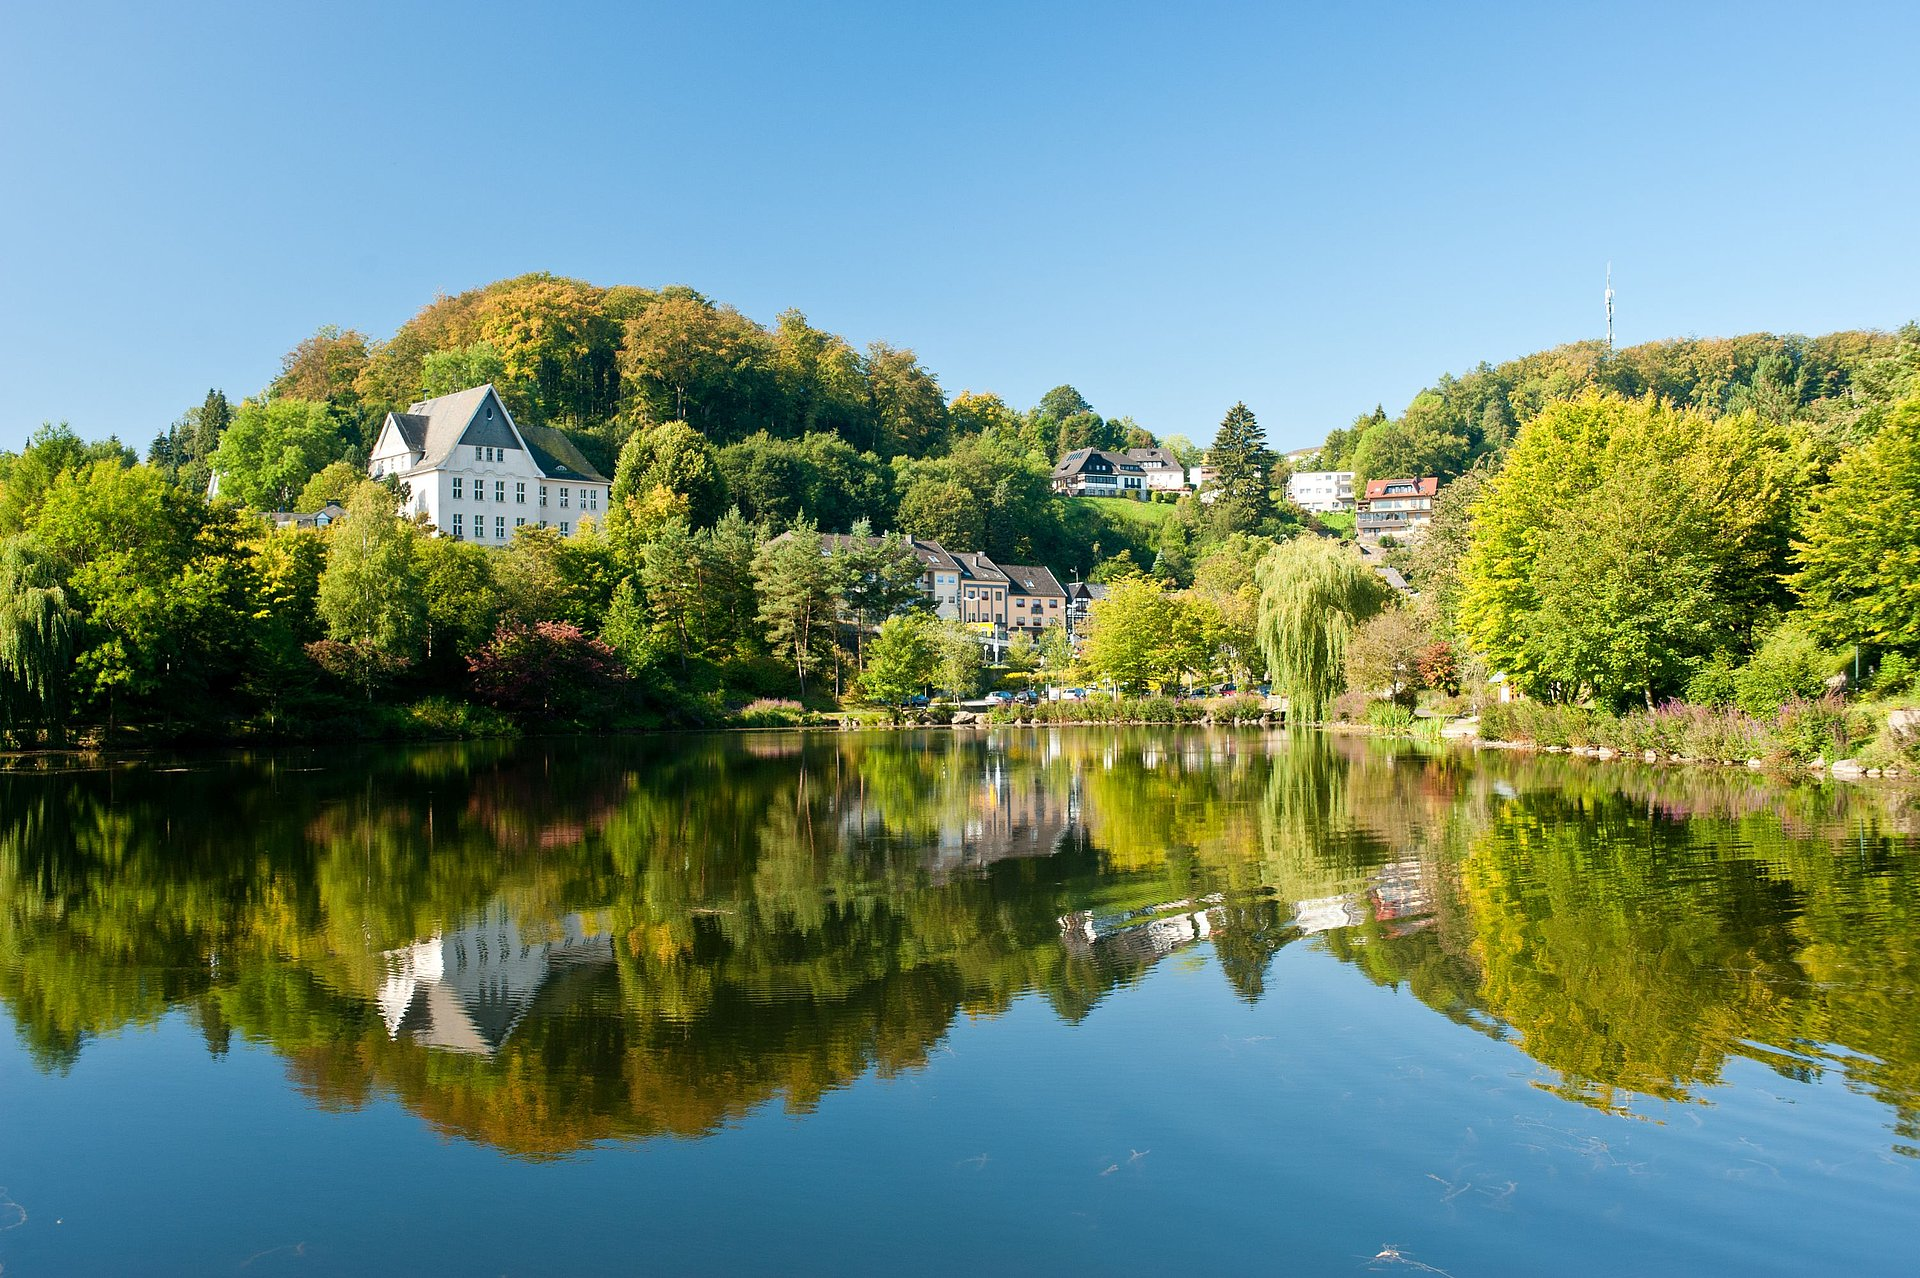 Schwanenweiher Blankenheim, Eifel